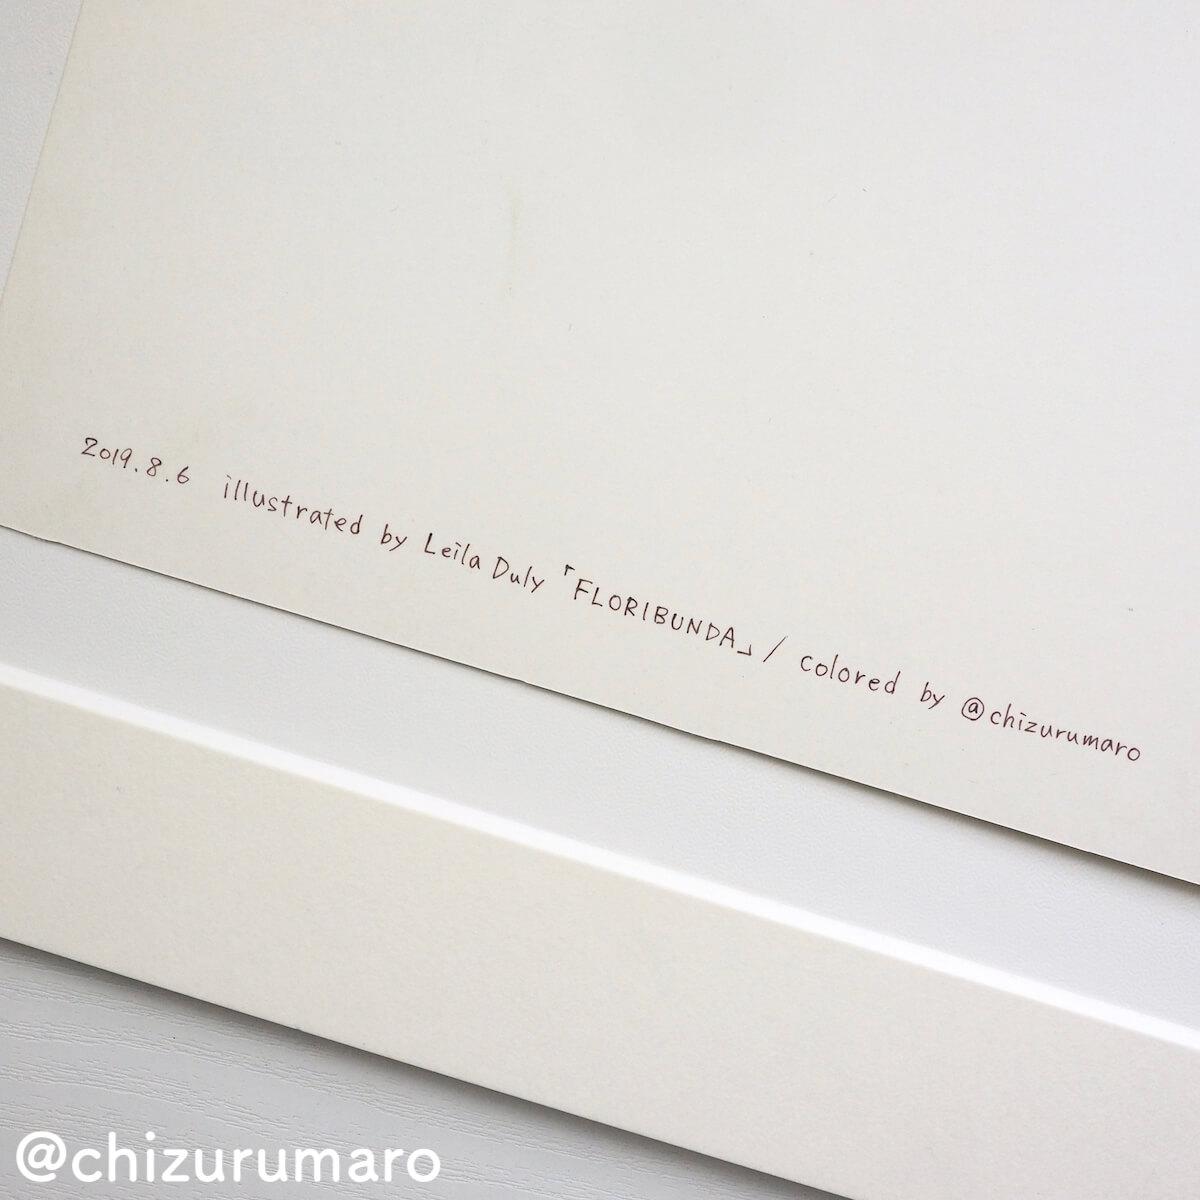 f:id:chizurumaro:20190902160457j:plain